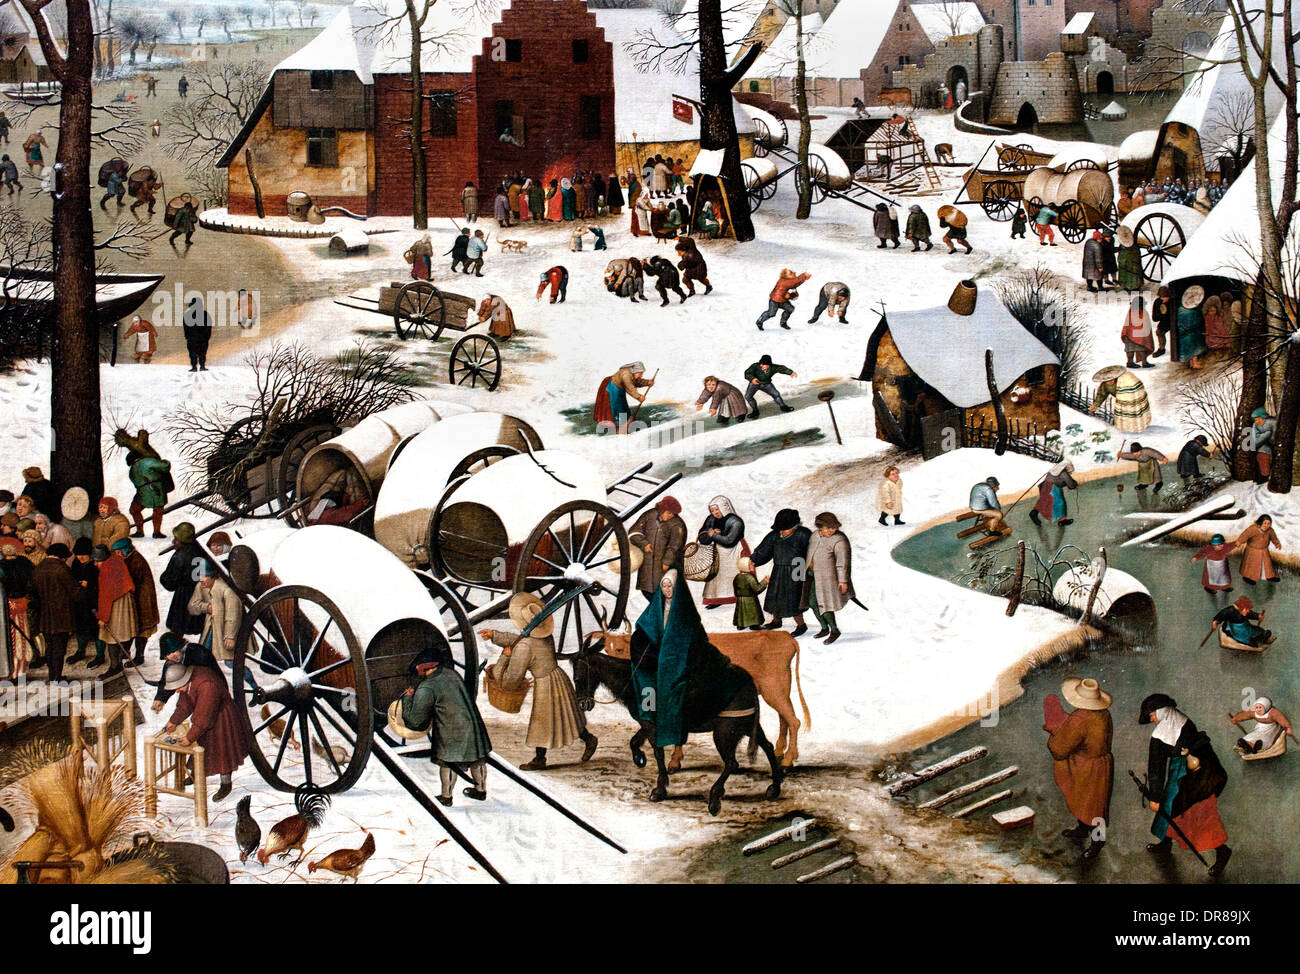 Pieter Brueghel the Younger 1564 - 1638 Antwerp Belgian Belgium The enumeration of Bethlehem - Stock Image